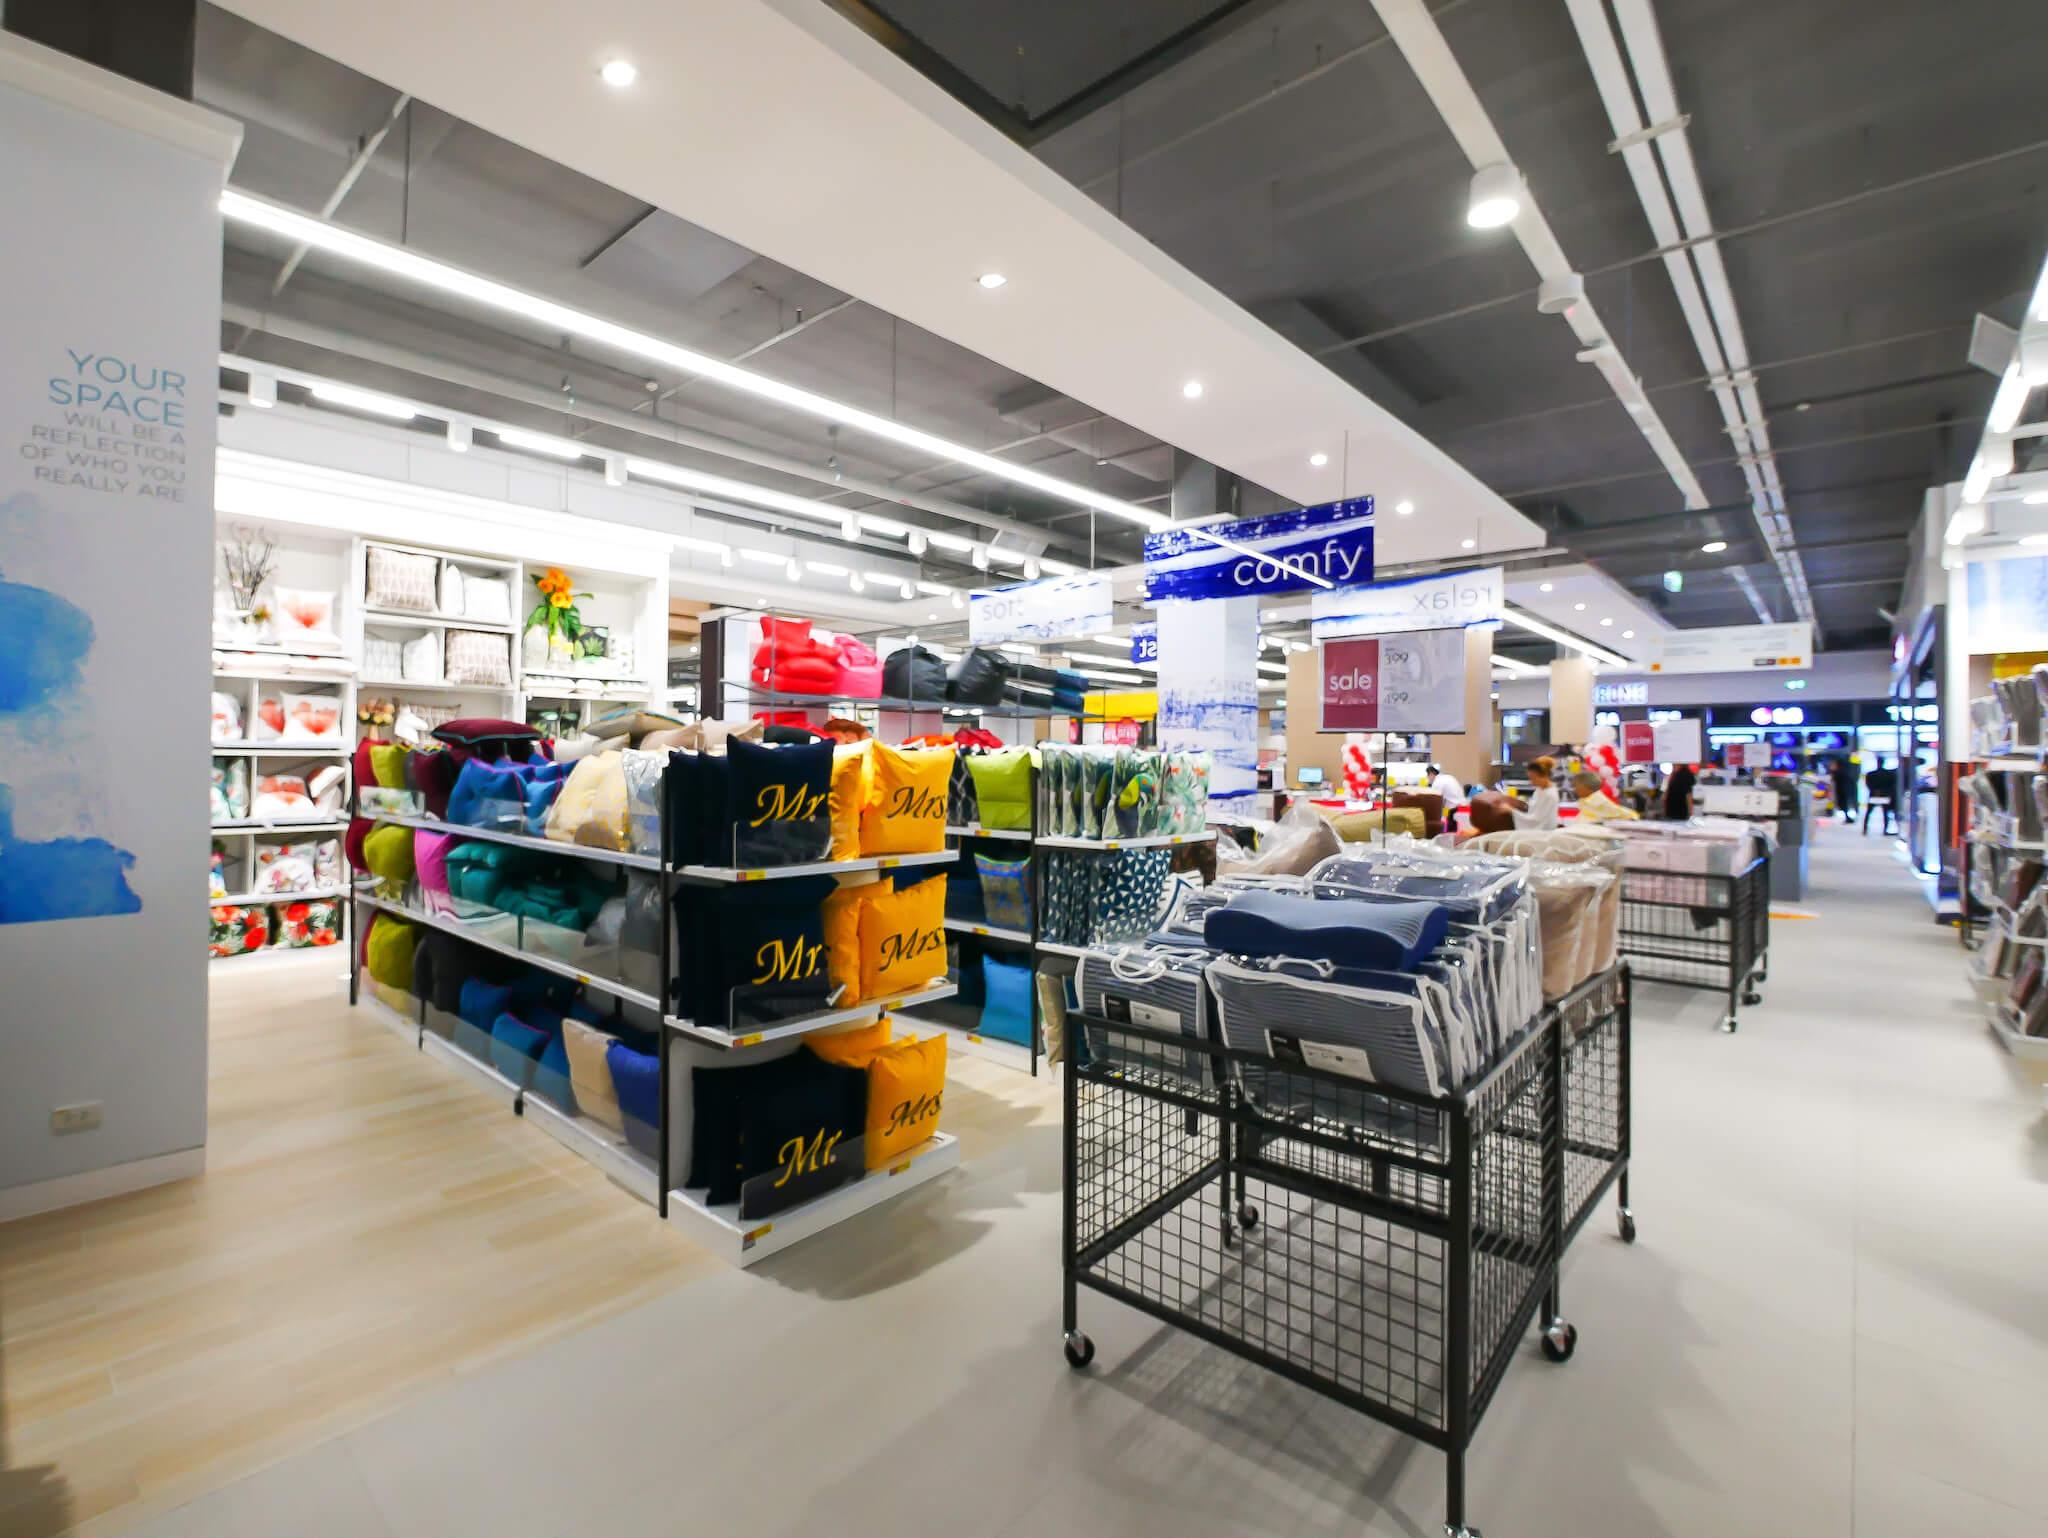 "Index Living Mall พระราม 2 เปิดใหม่ไม่ใช่แค่ ""ร้านเฟอร์นิเจอร์"" แต่เป็น ""Lifestyle Destination"" แนว URBAN STYLISH 35 - Index Living Mall (อินเด็กซ์ ลิฟวิ่งมอลล์)"